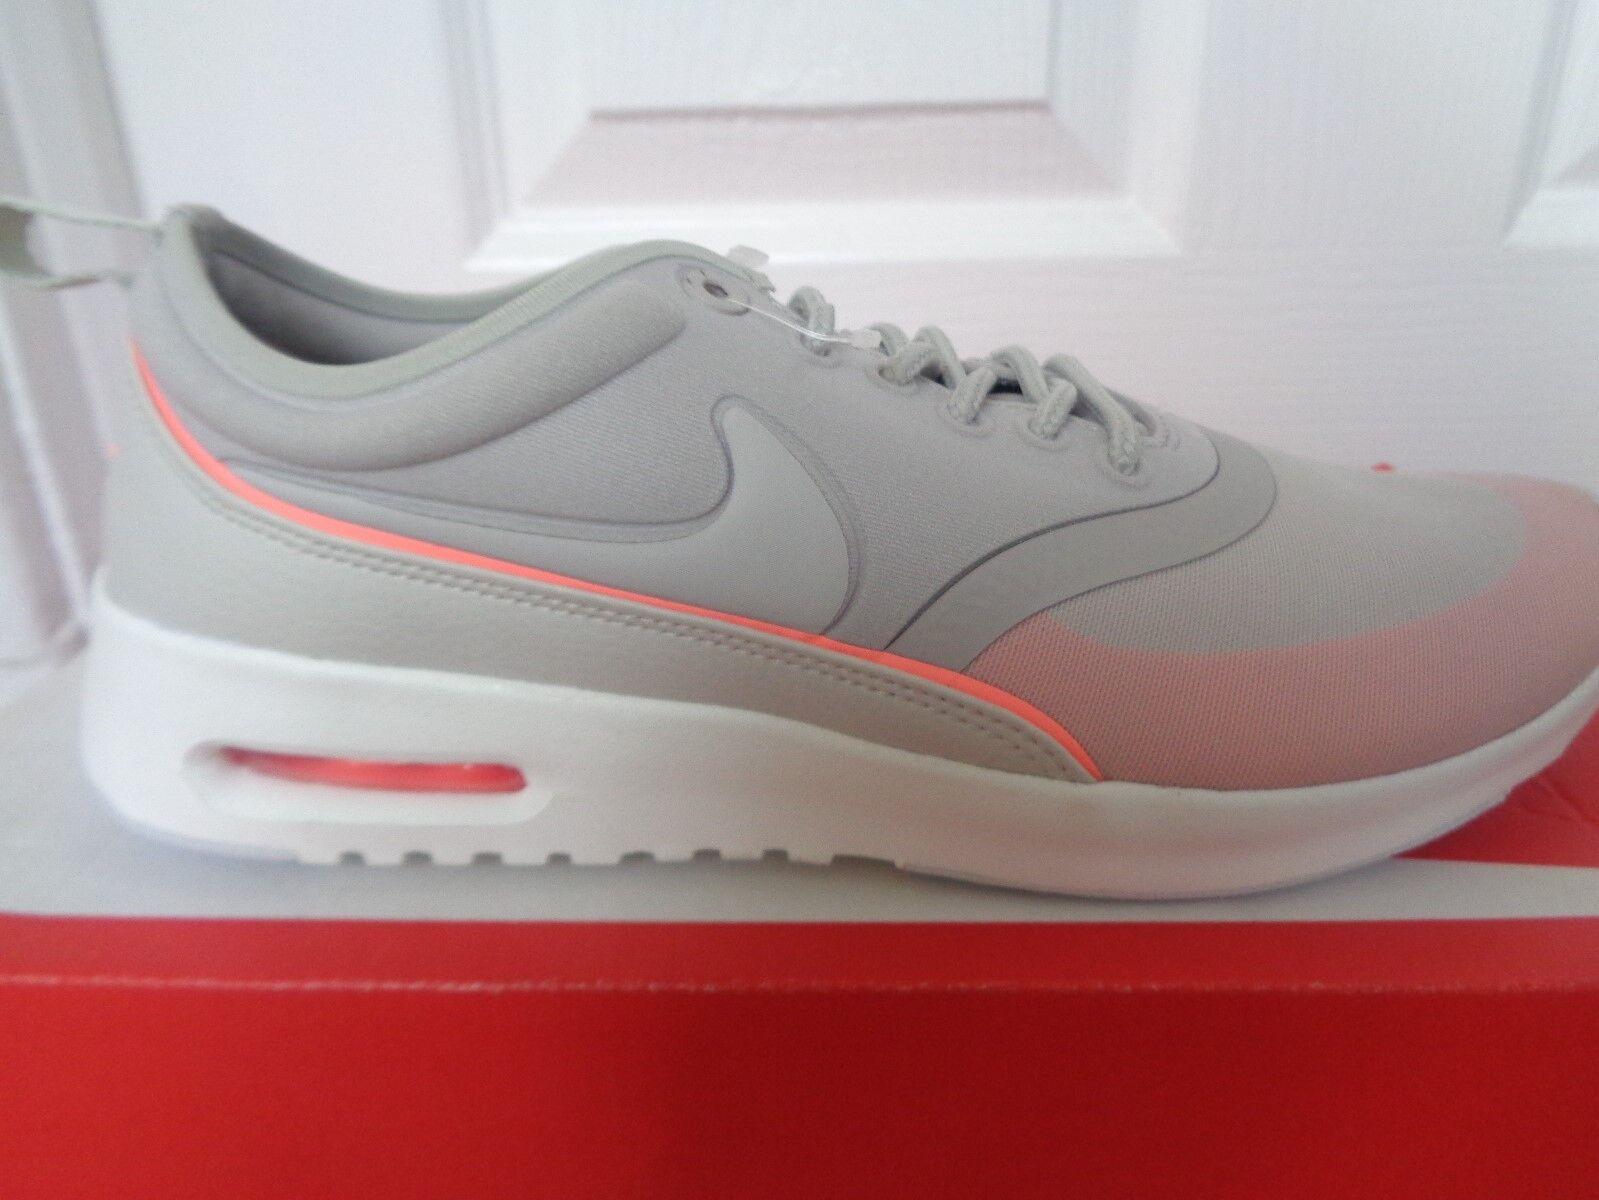 Nike Air Max Thea Ultra Scarpe 844926 Da  Ginnastica da Donna 844926  Da  0fcea5